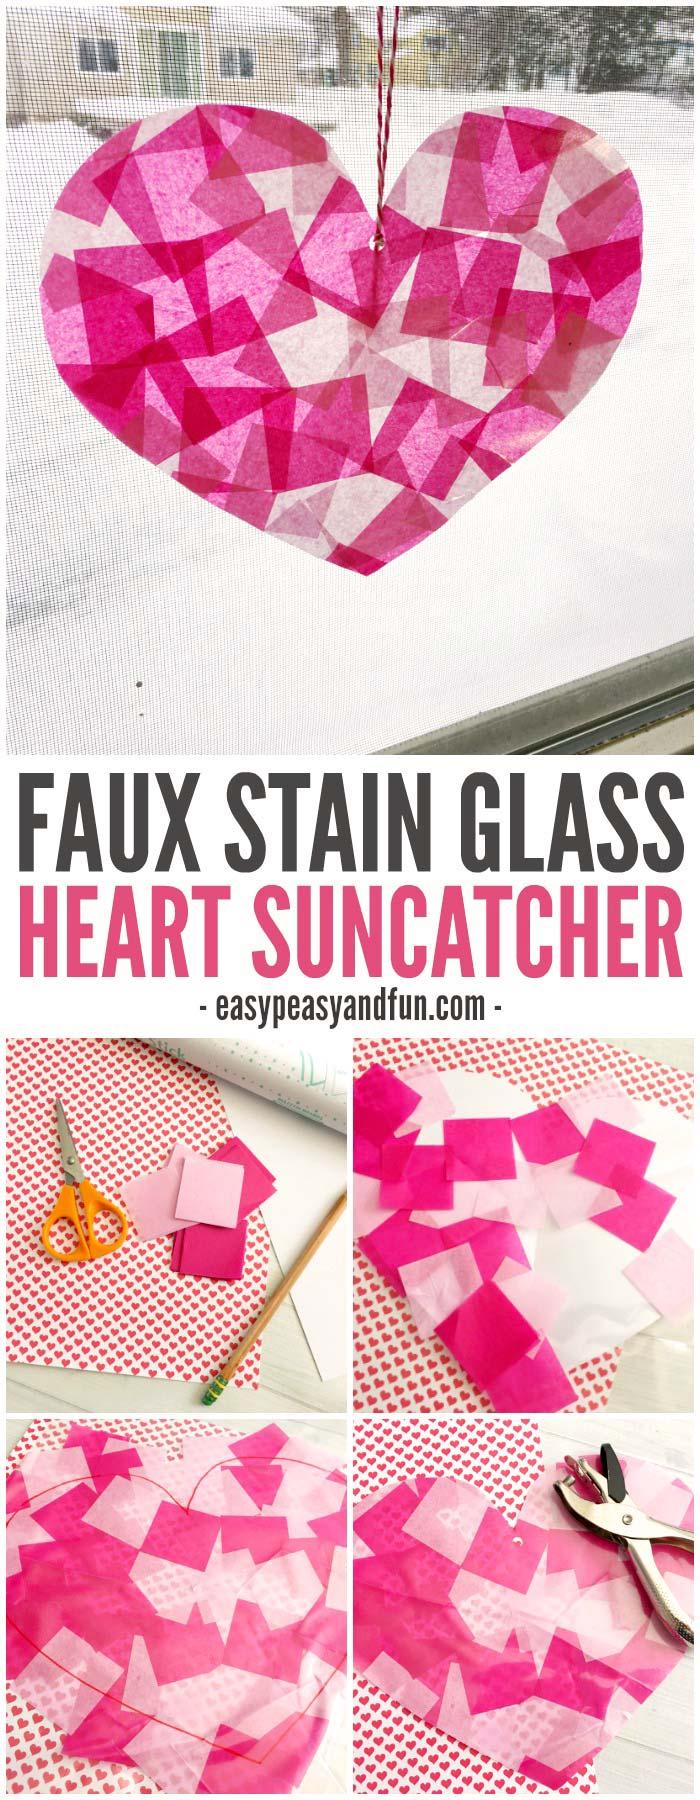 Faux Stain Glass Heart Suncatcher Craft